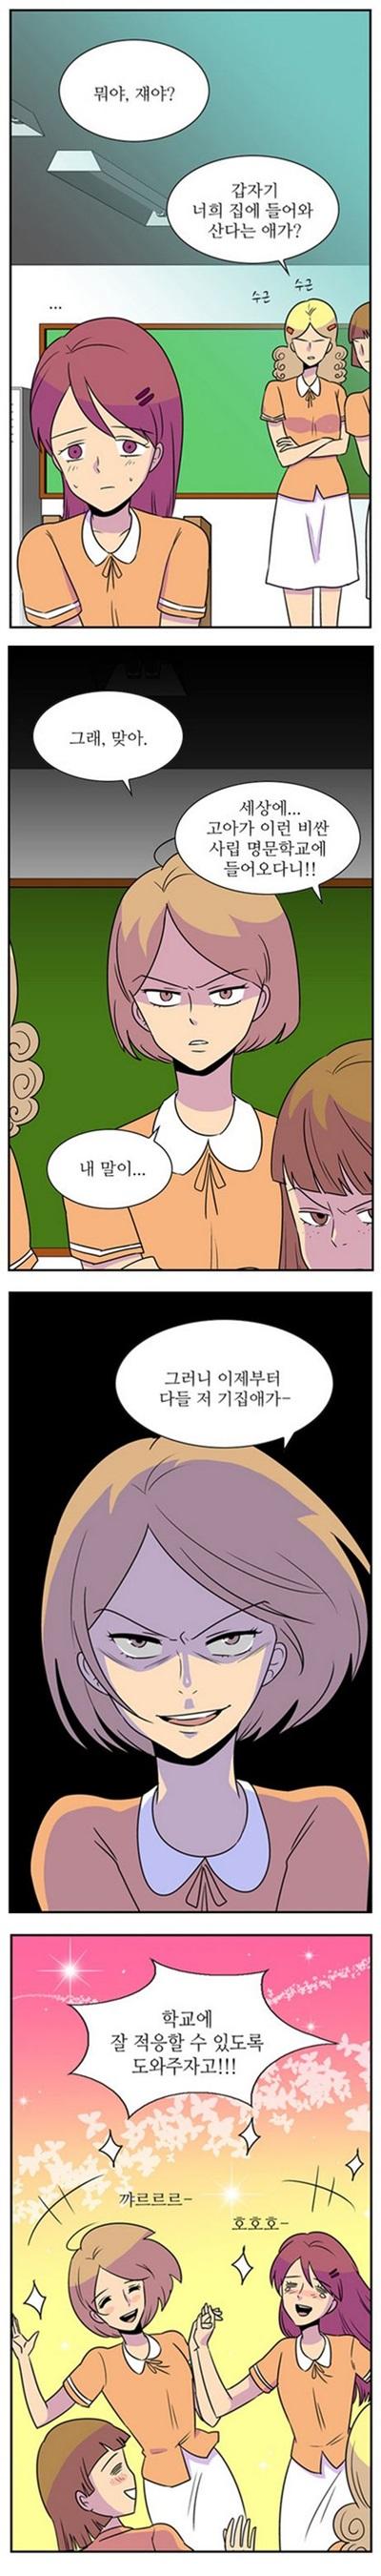 『SM 플레이어』 시즌1 37화 「쌀쌀맞지만 따뜻한 만화」. 온라인 커뮤니티에 퍼지며 화제를 낳았던 에피소드. 츤데레는 사랑입니다.